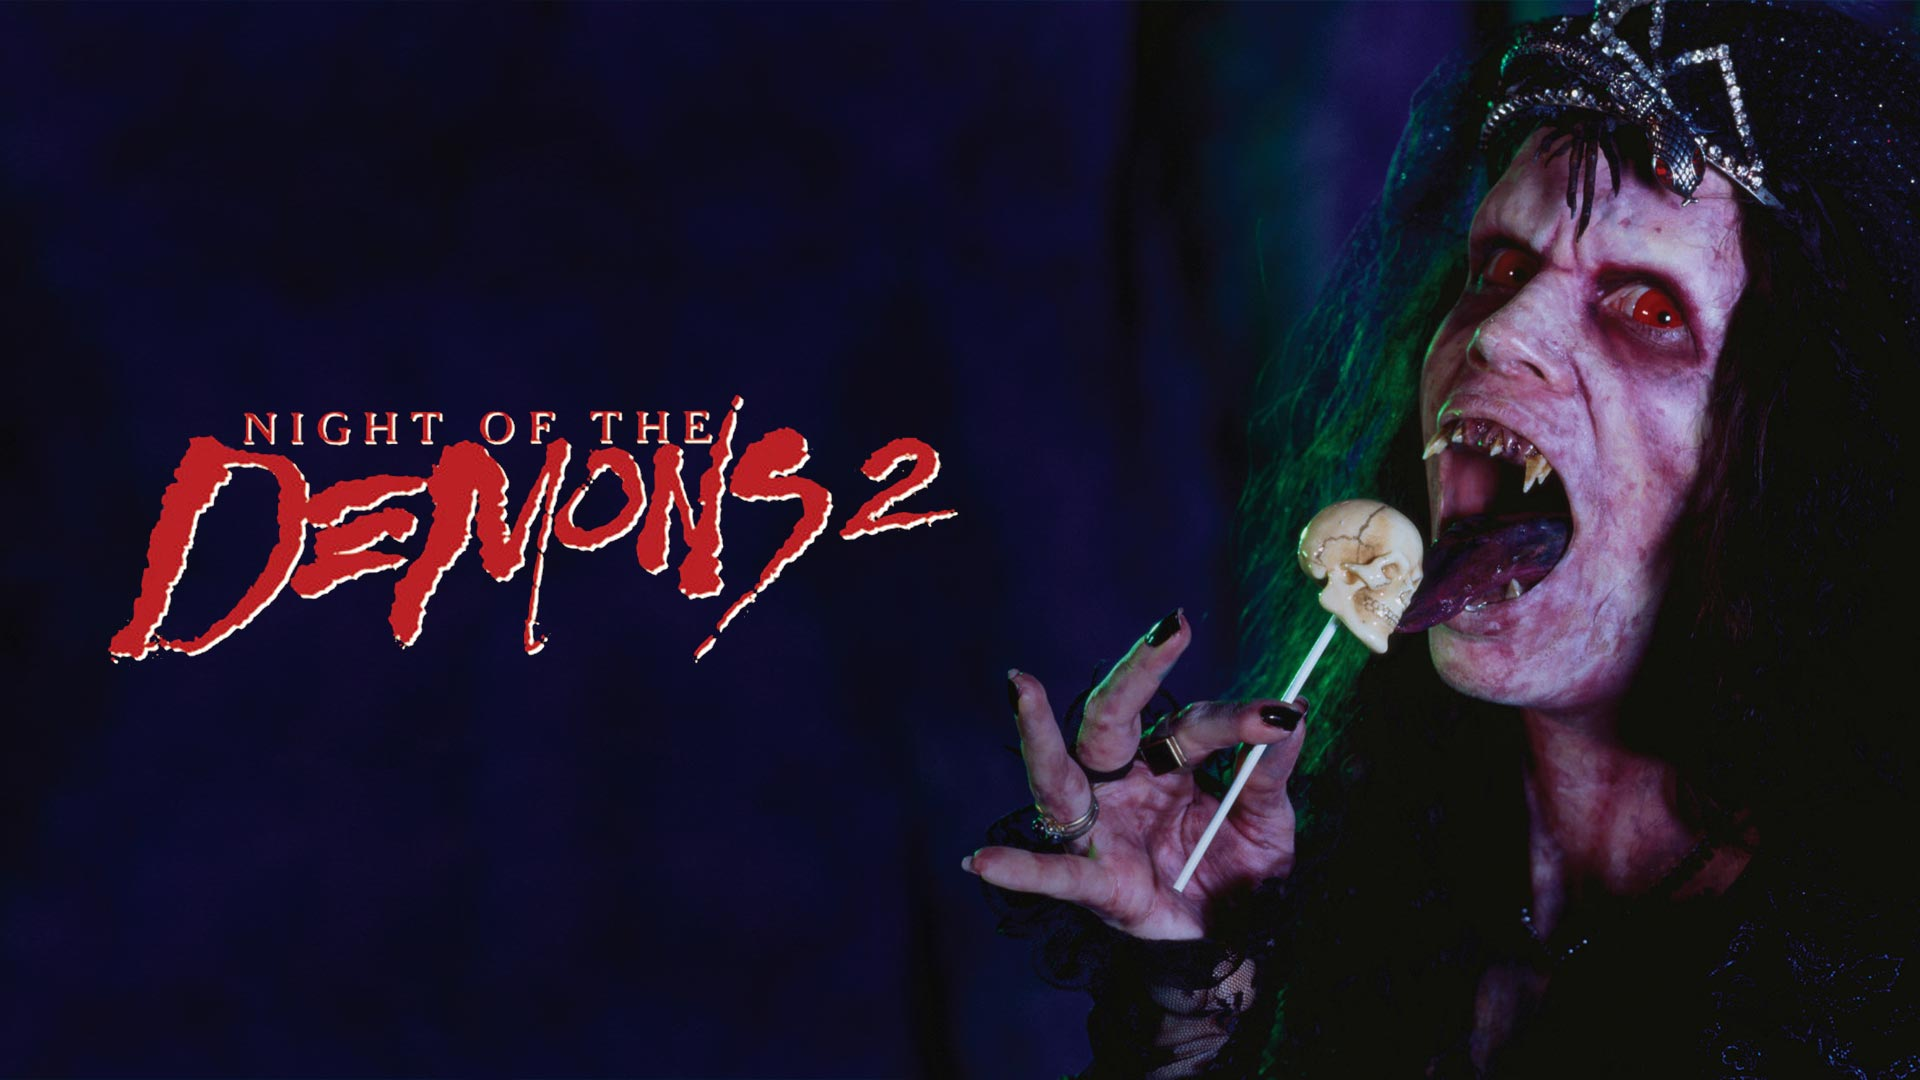 NIGHT OF THE DEMONS II